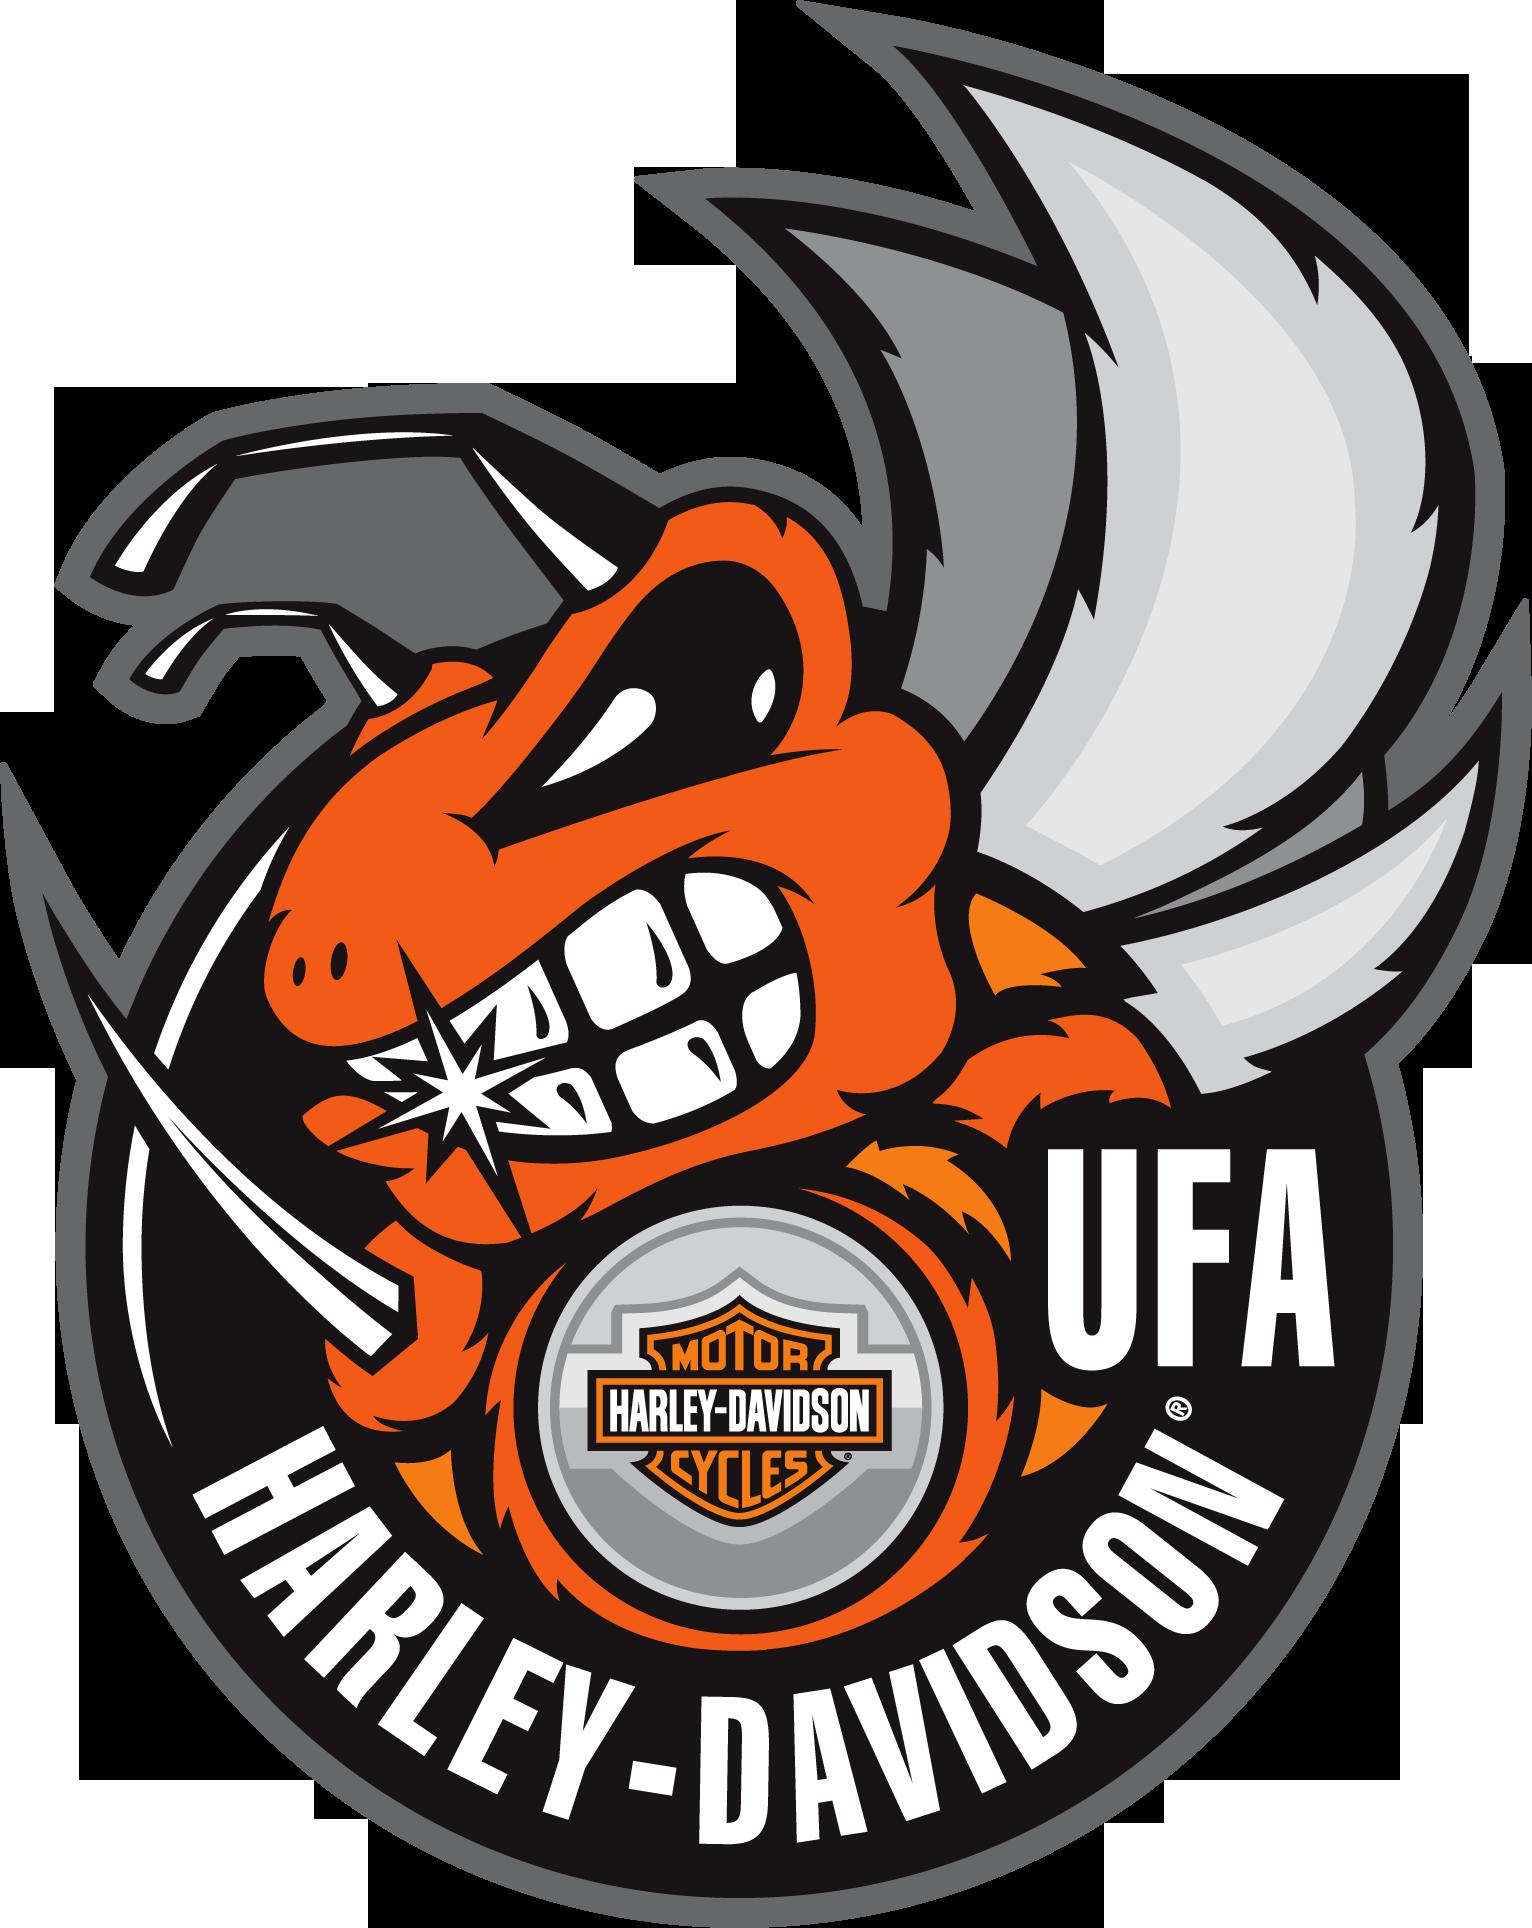 Harley-Davidson<sup>®</sup> Уфа